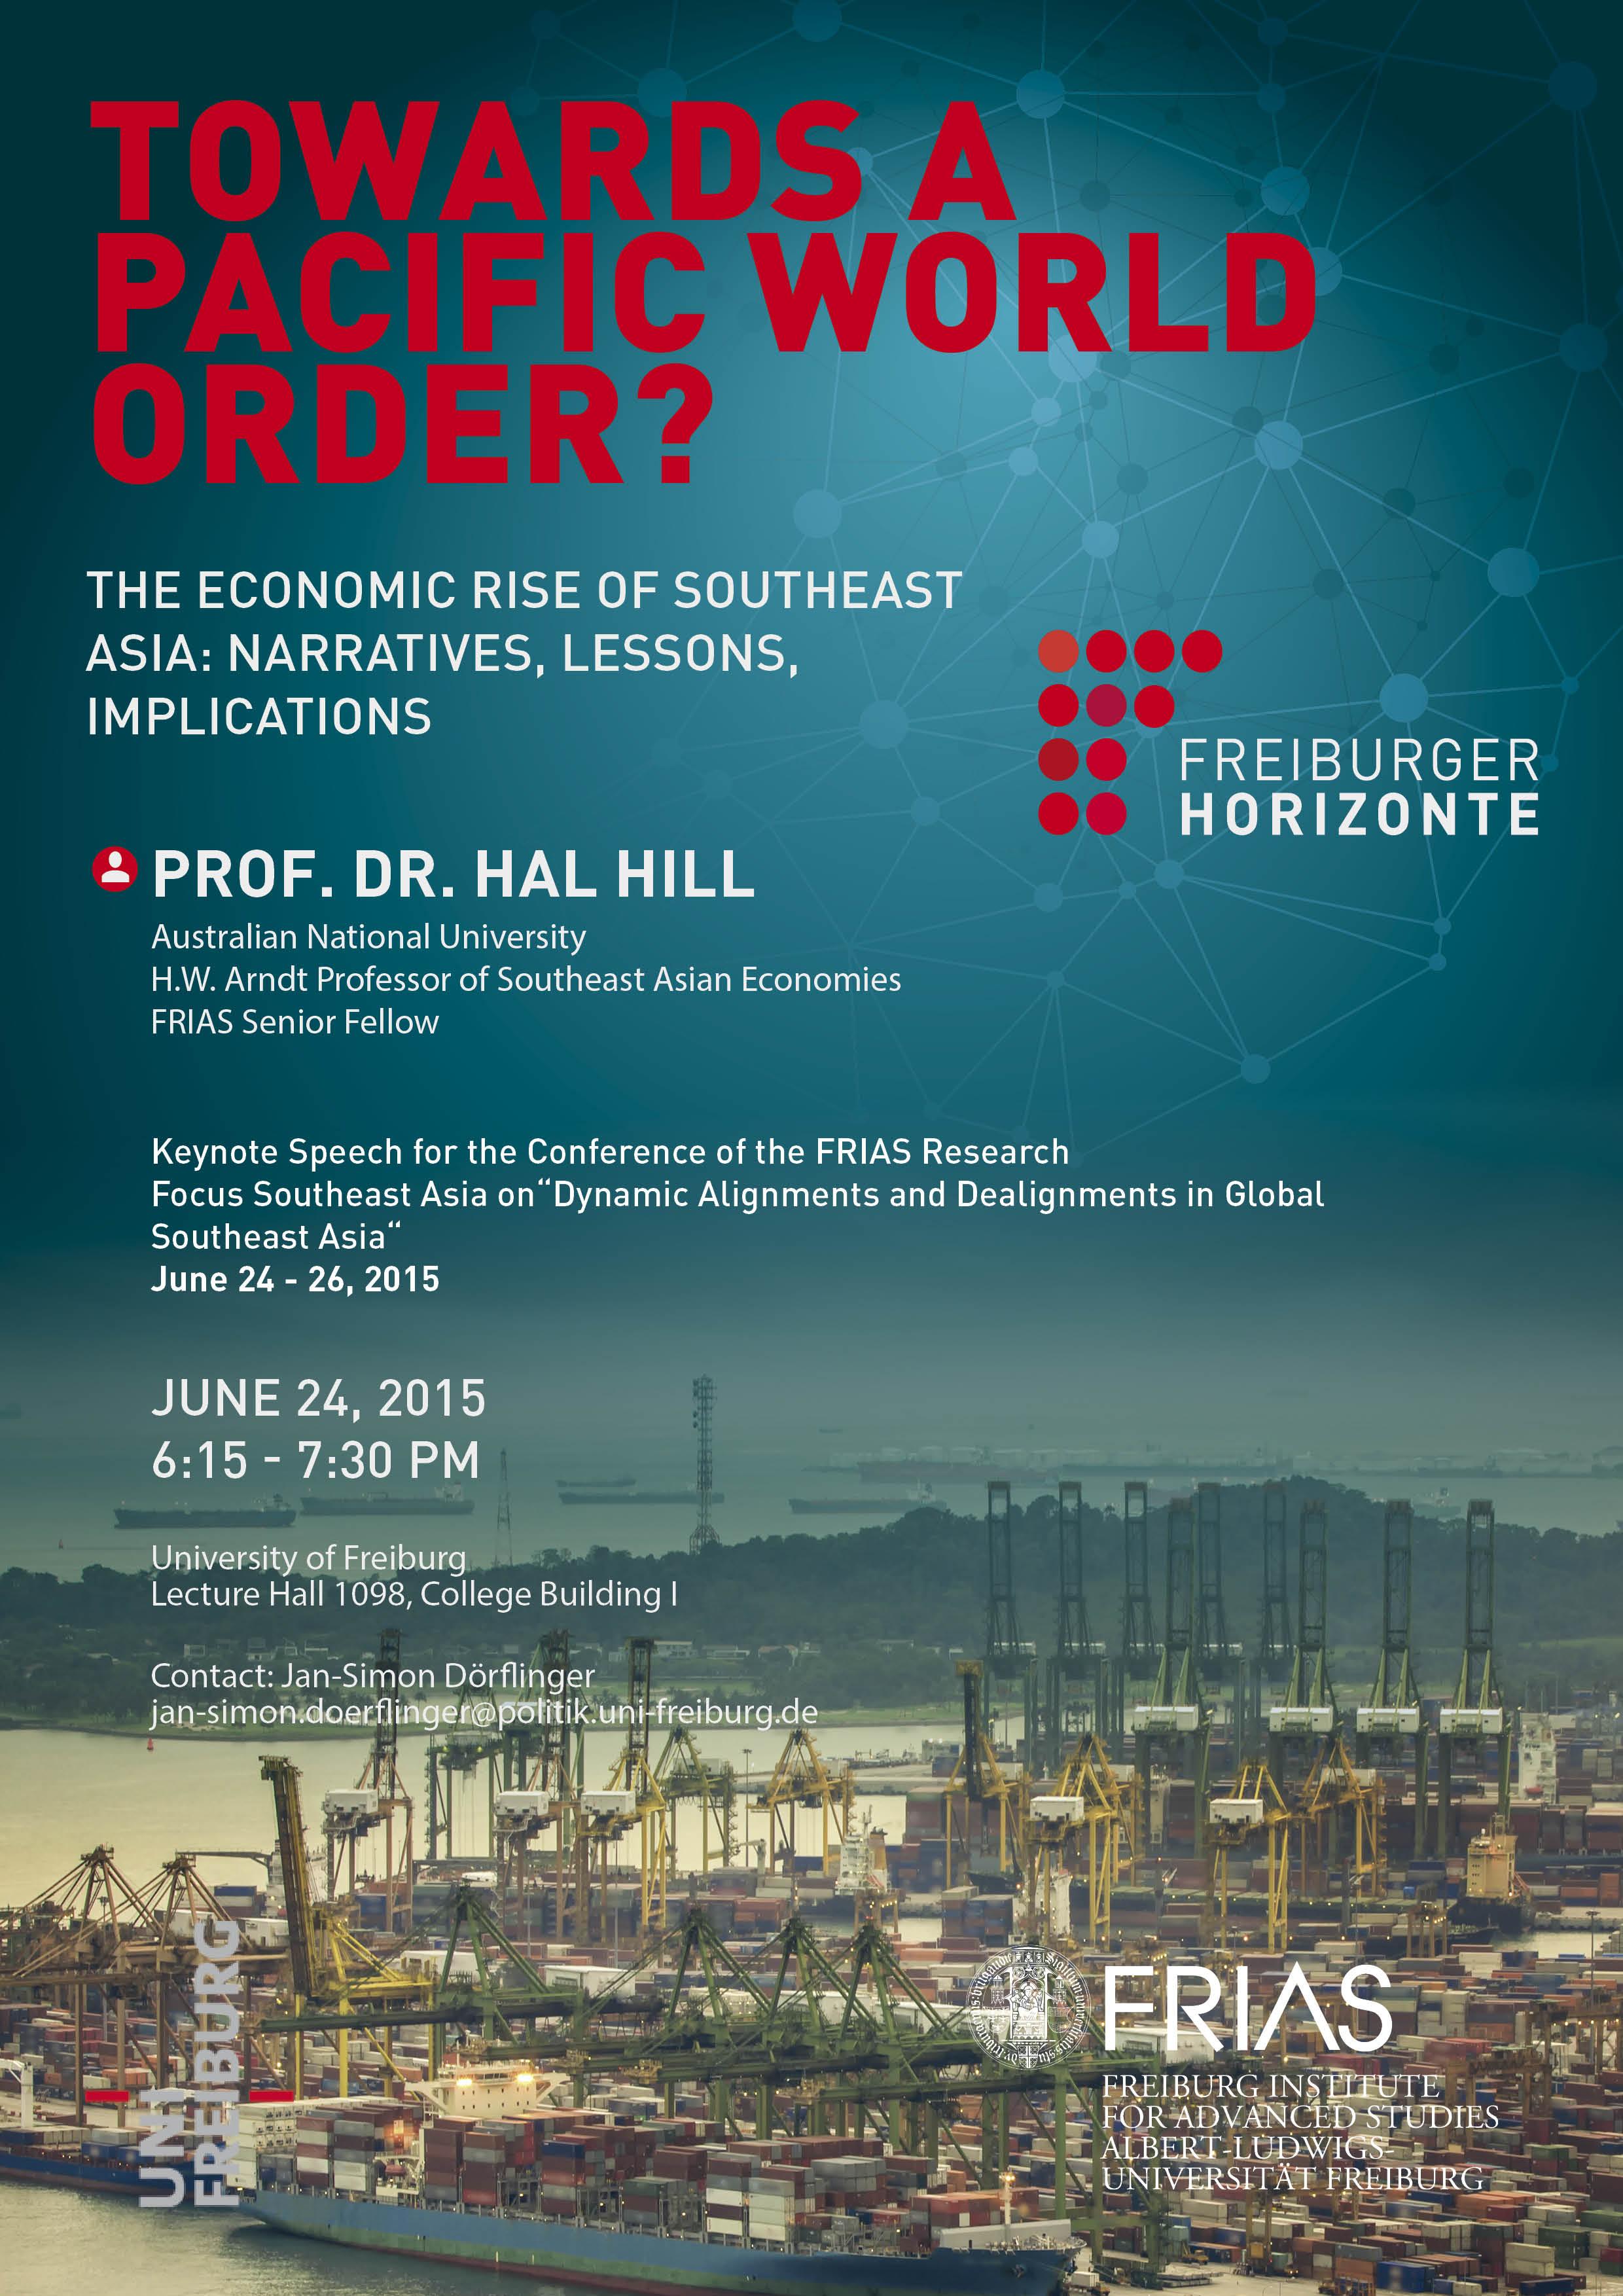 Freiburger Horizonte - Vortragsabend mit Hal Hill am 24. Juni 2015